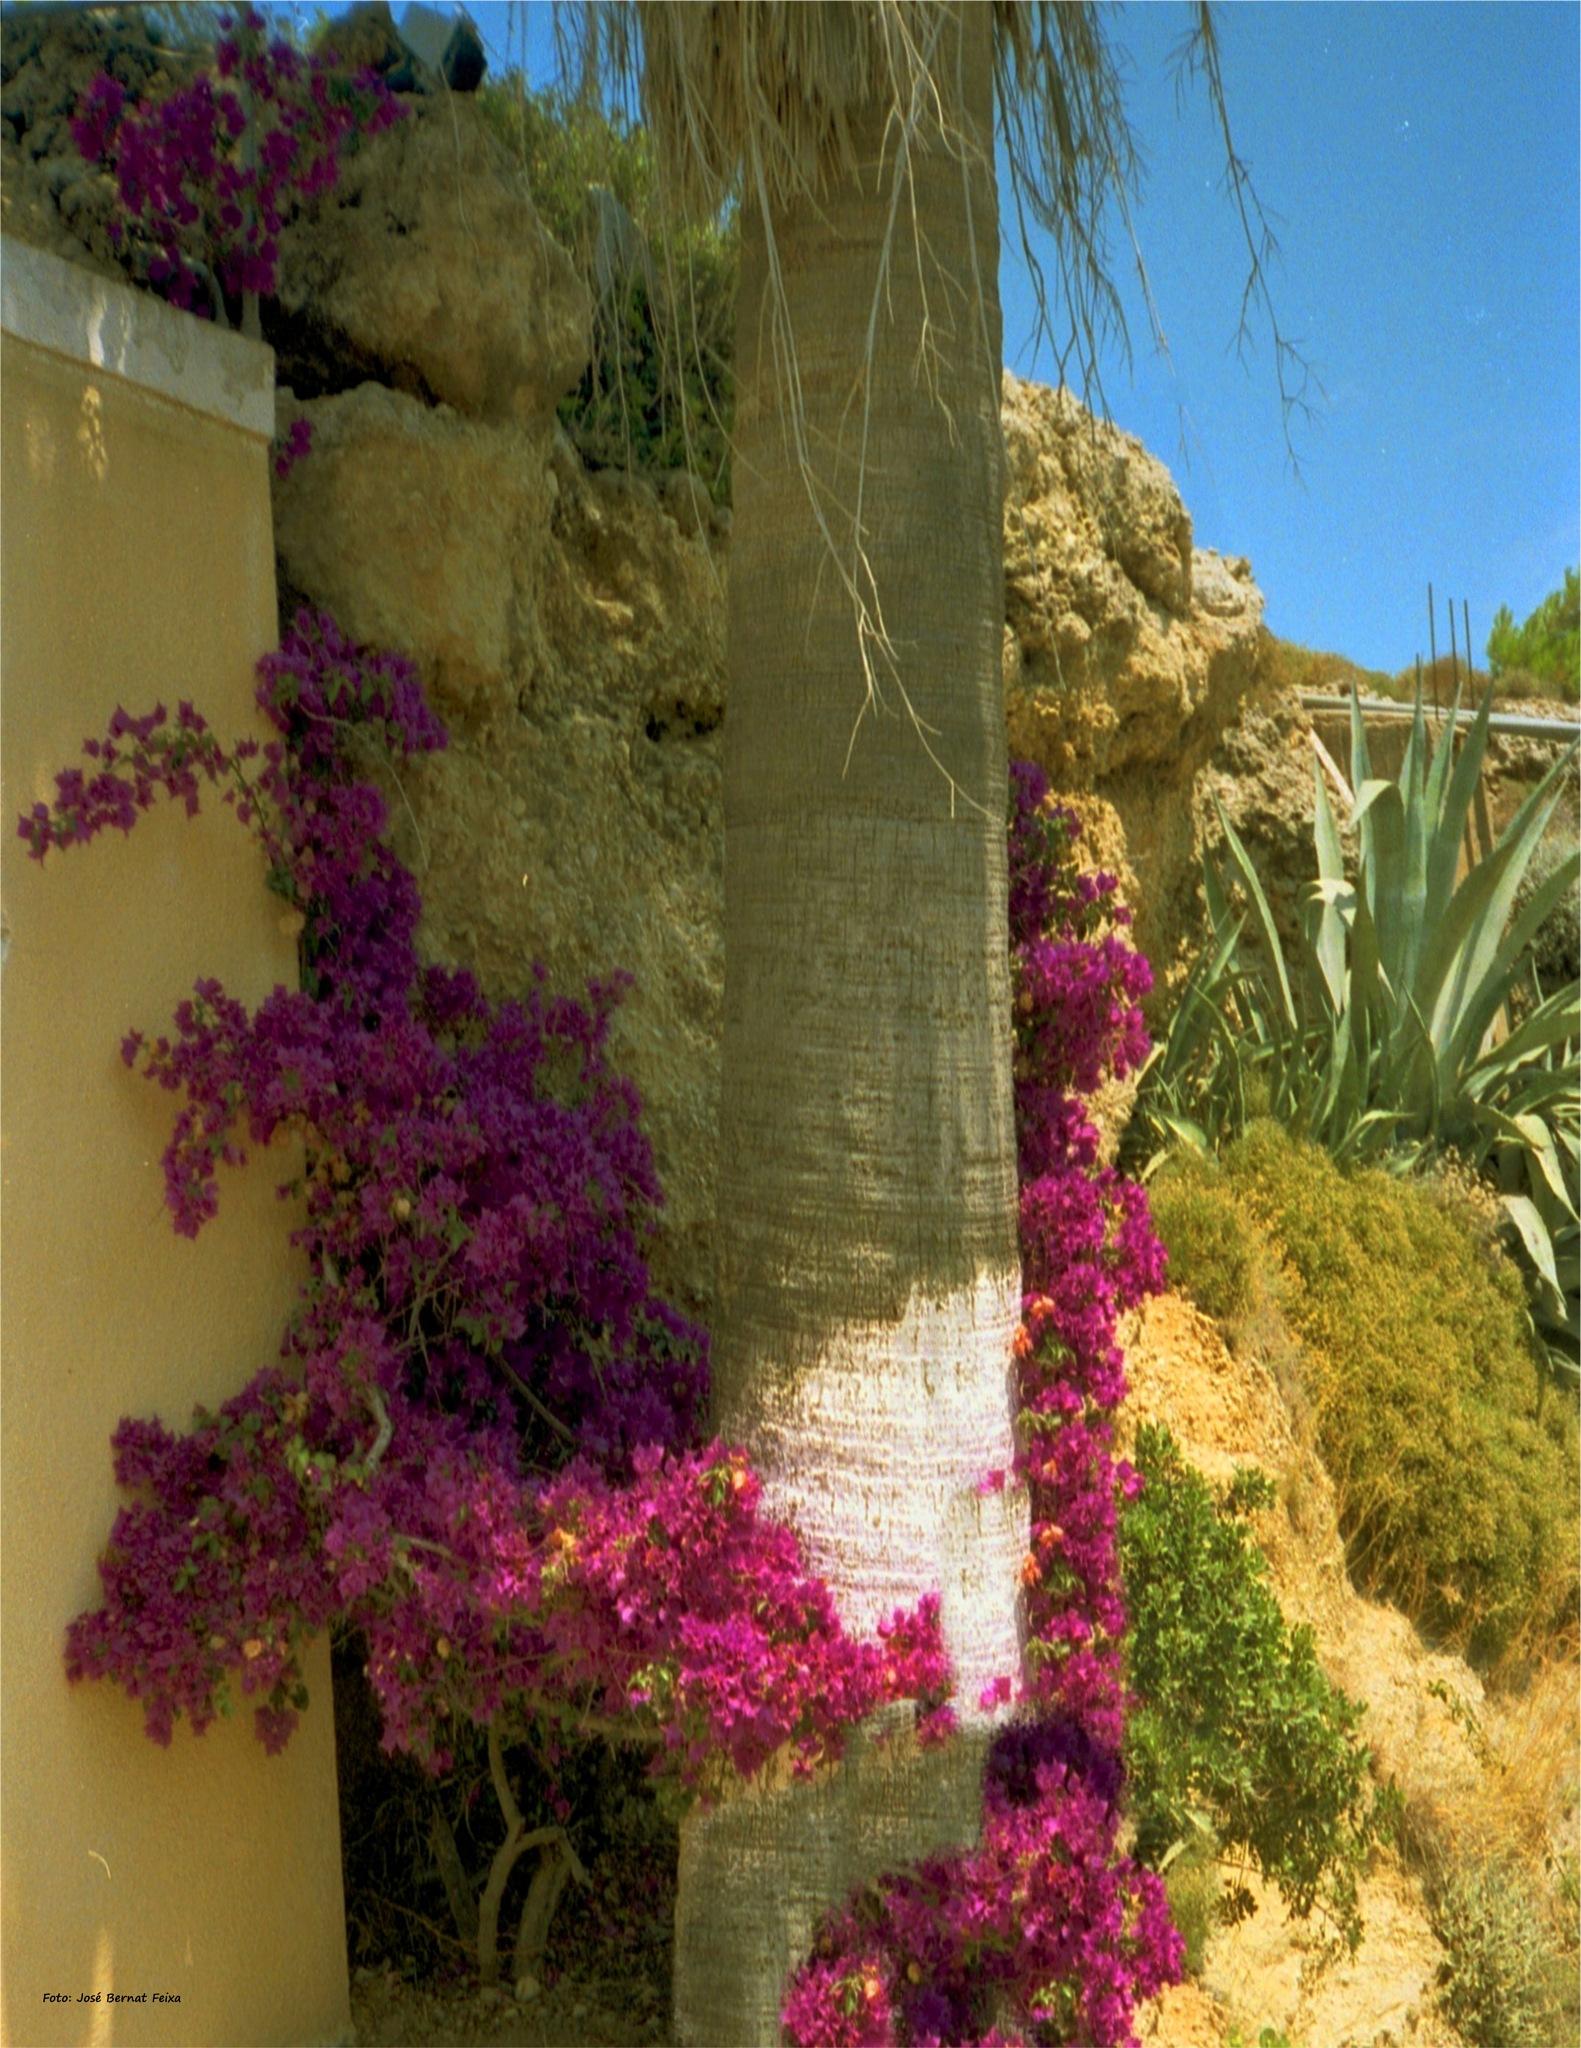 FLORES Y PLANTAS ; BLOEMEN EN PLANTEN ; FLOWERS AND PLANTS by José Bernat Feixa